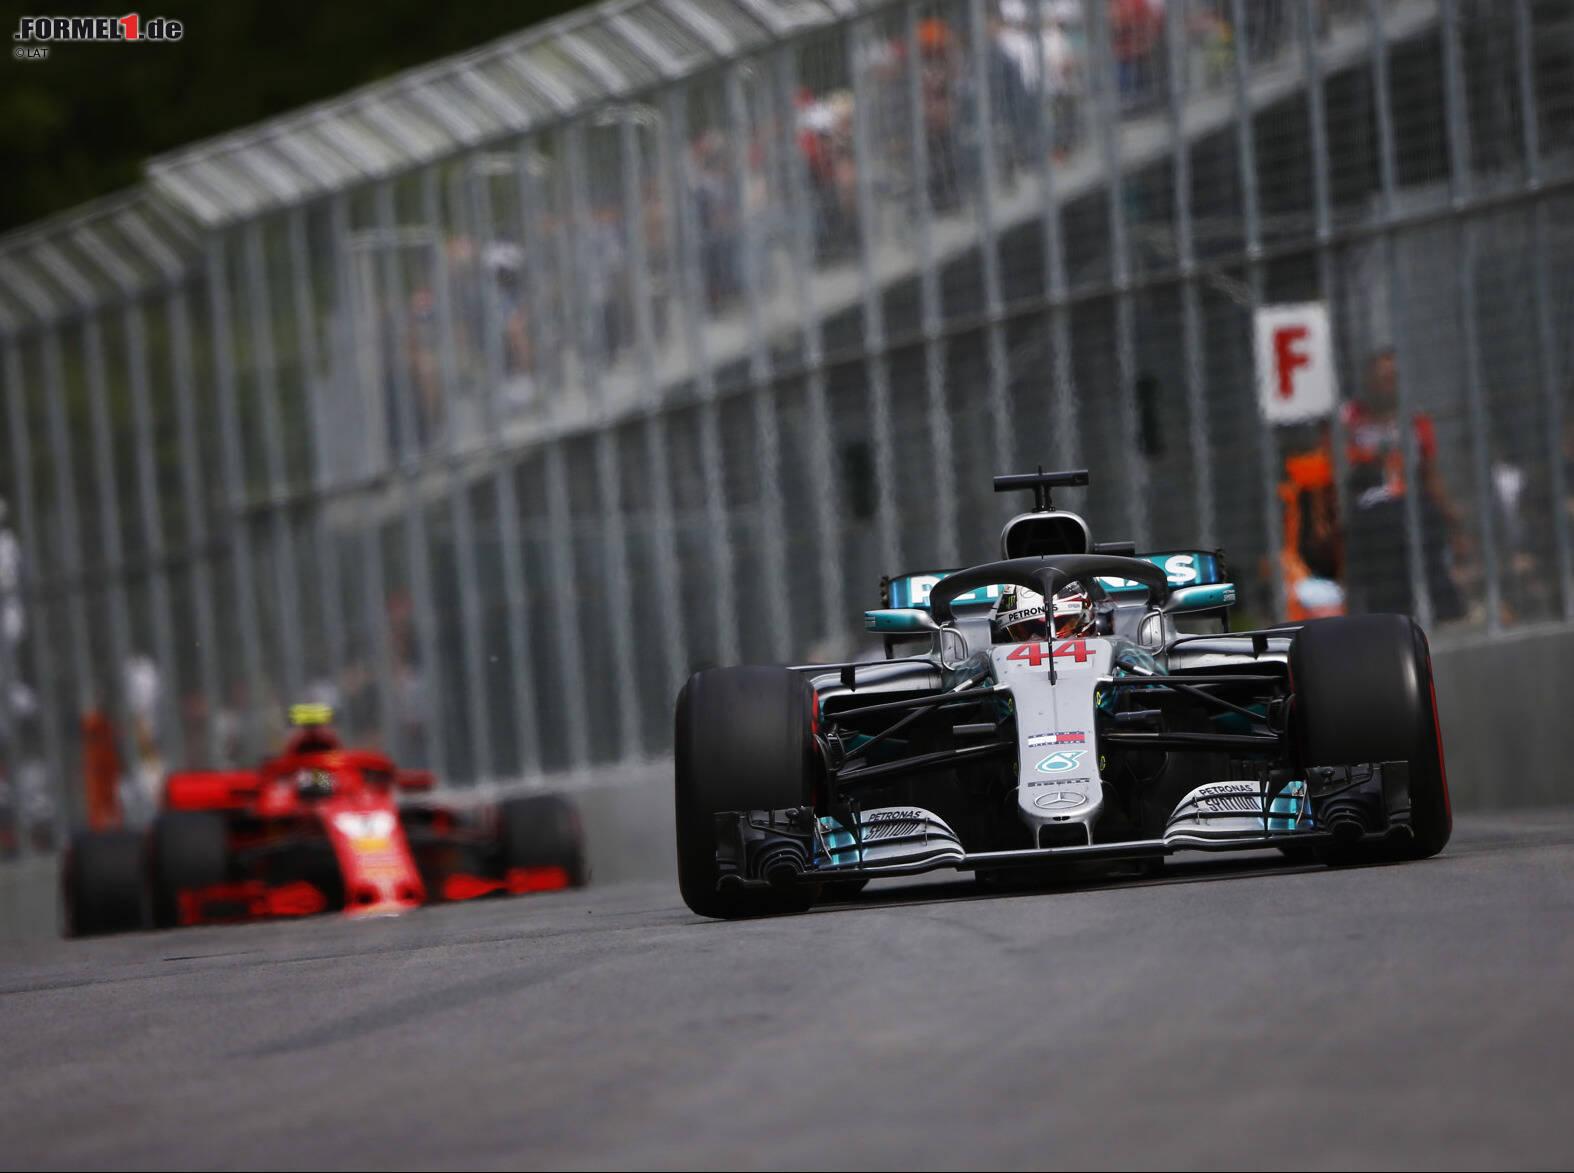 Formel 1 Live Stream Illegal